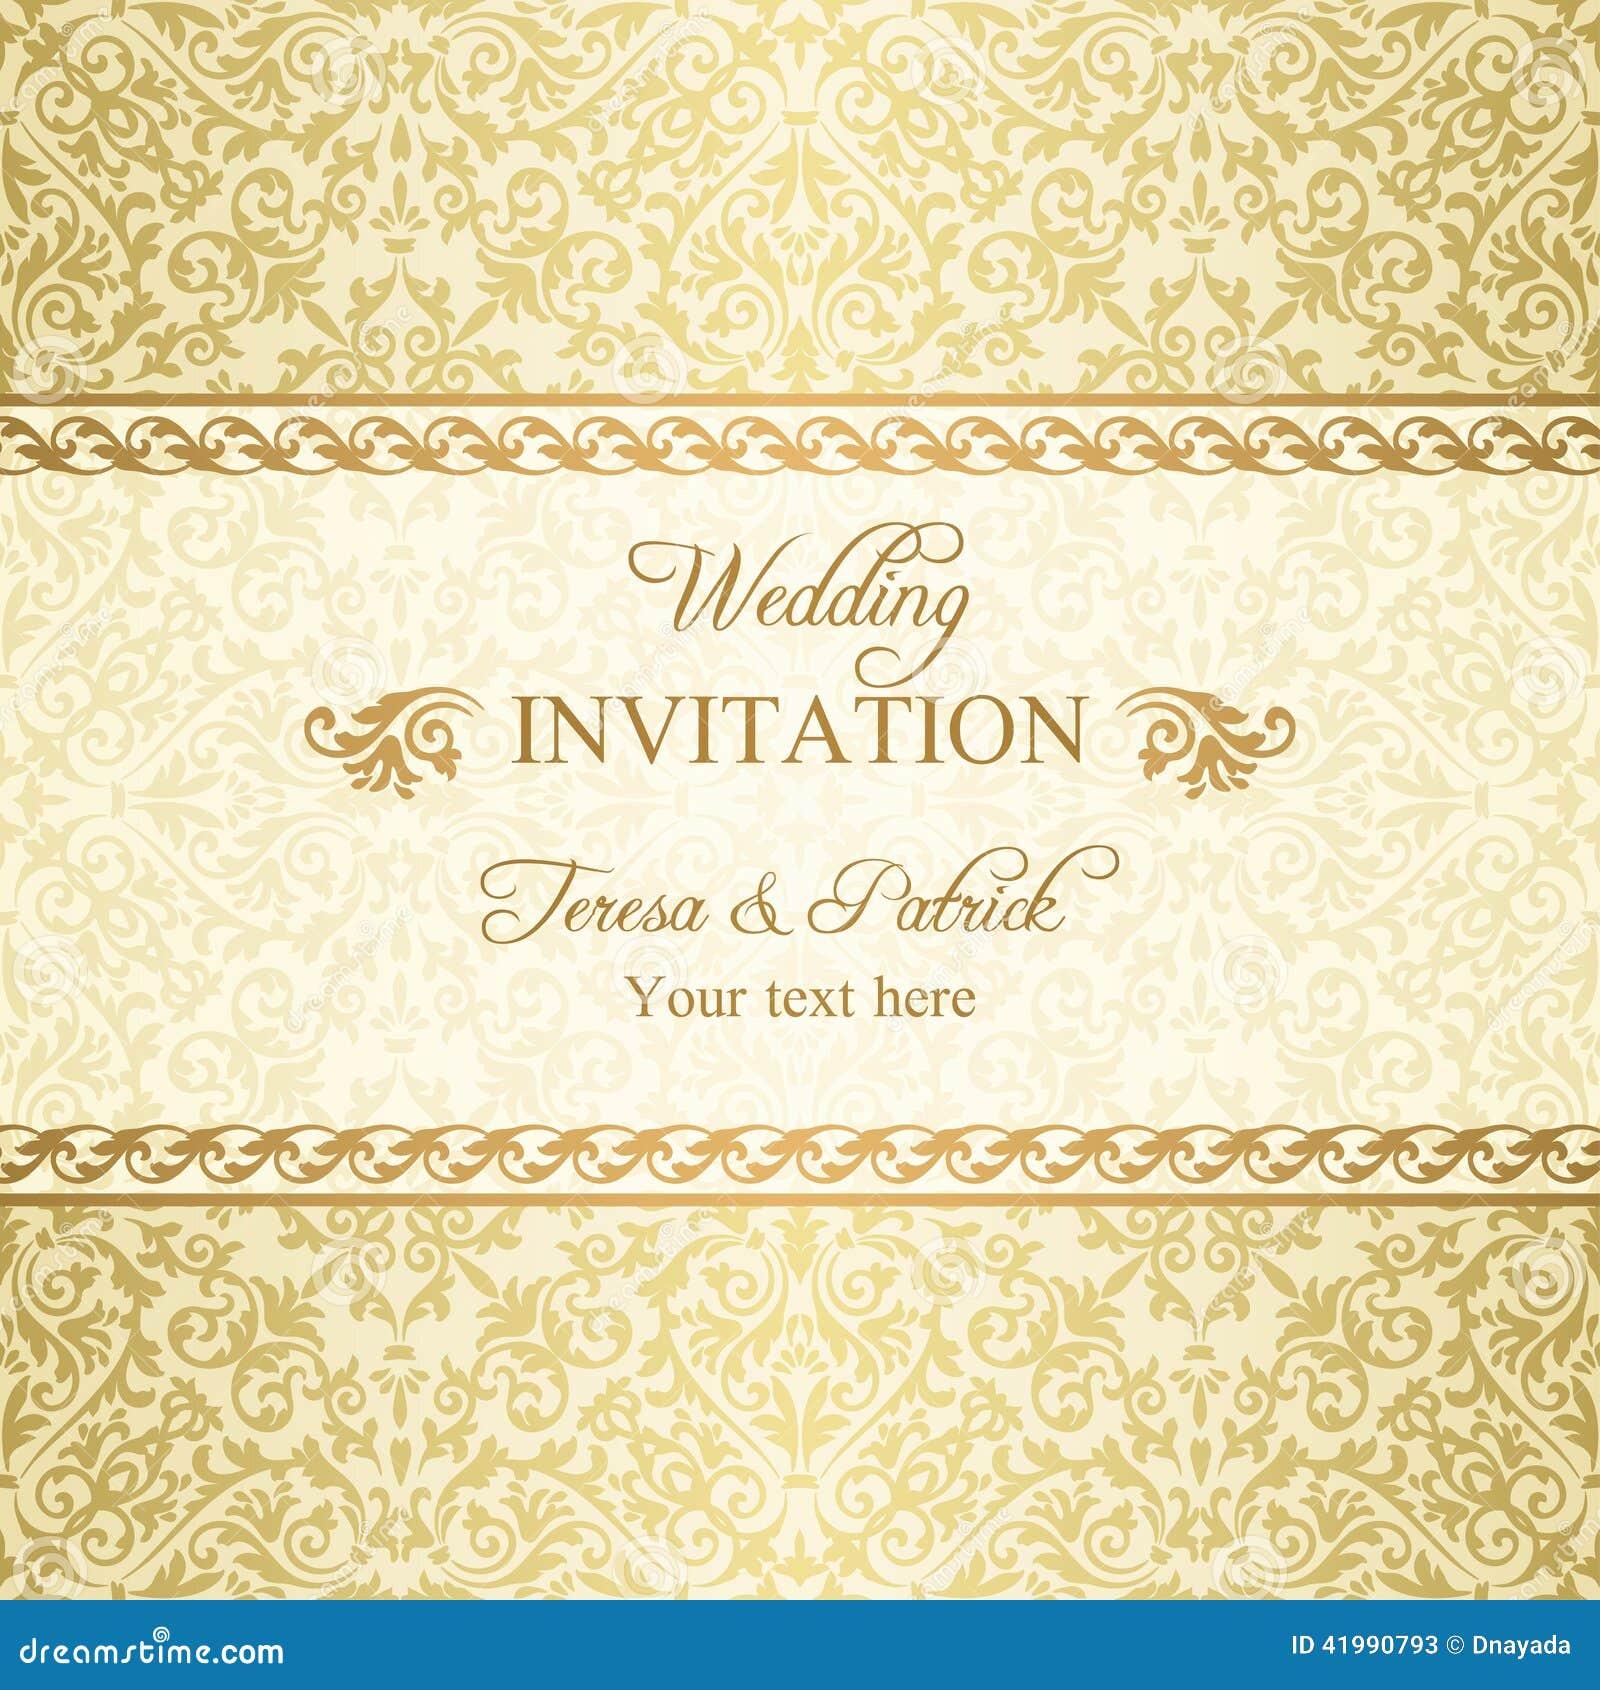 Barokke huwelijksuitnodiging, goud